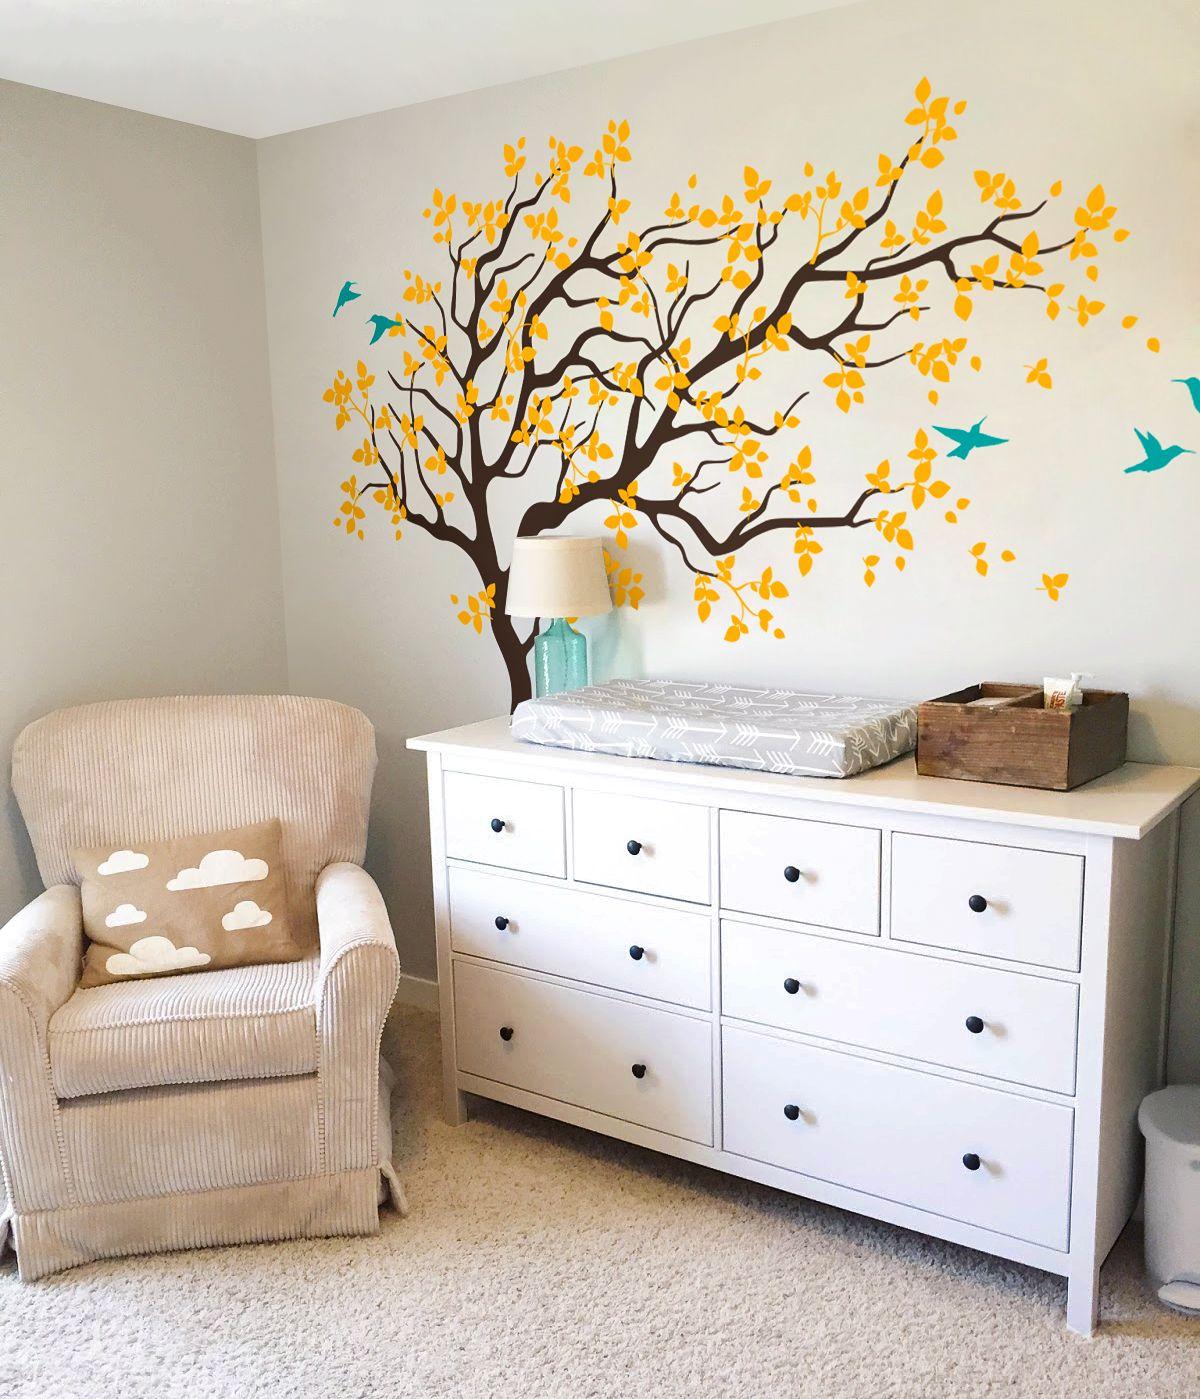 Beautiful Tree Wall Decal With Birds Mural For Kids Room Nursery Beautifultree Yellowleaves